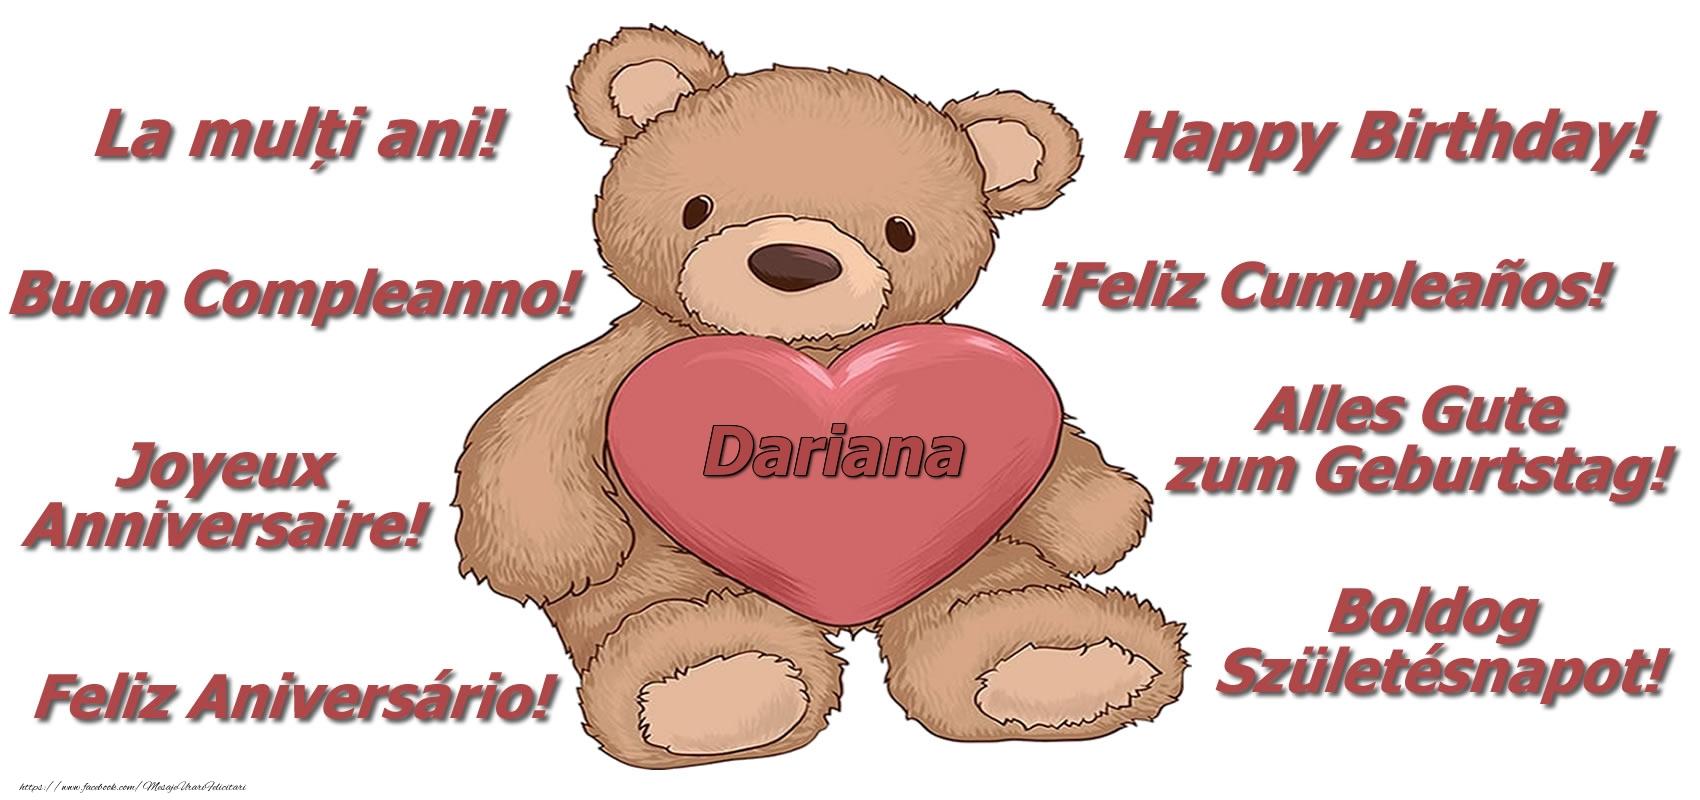 Felicitari de zi de nastere - La multi ani Dariana! - Ursulet